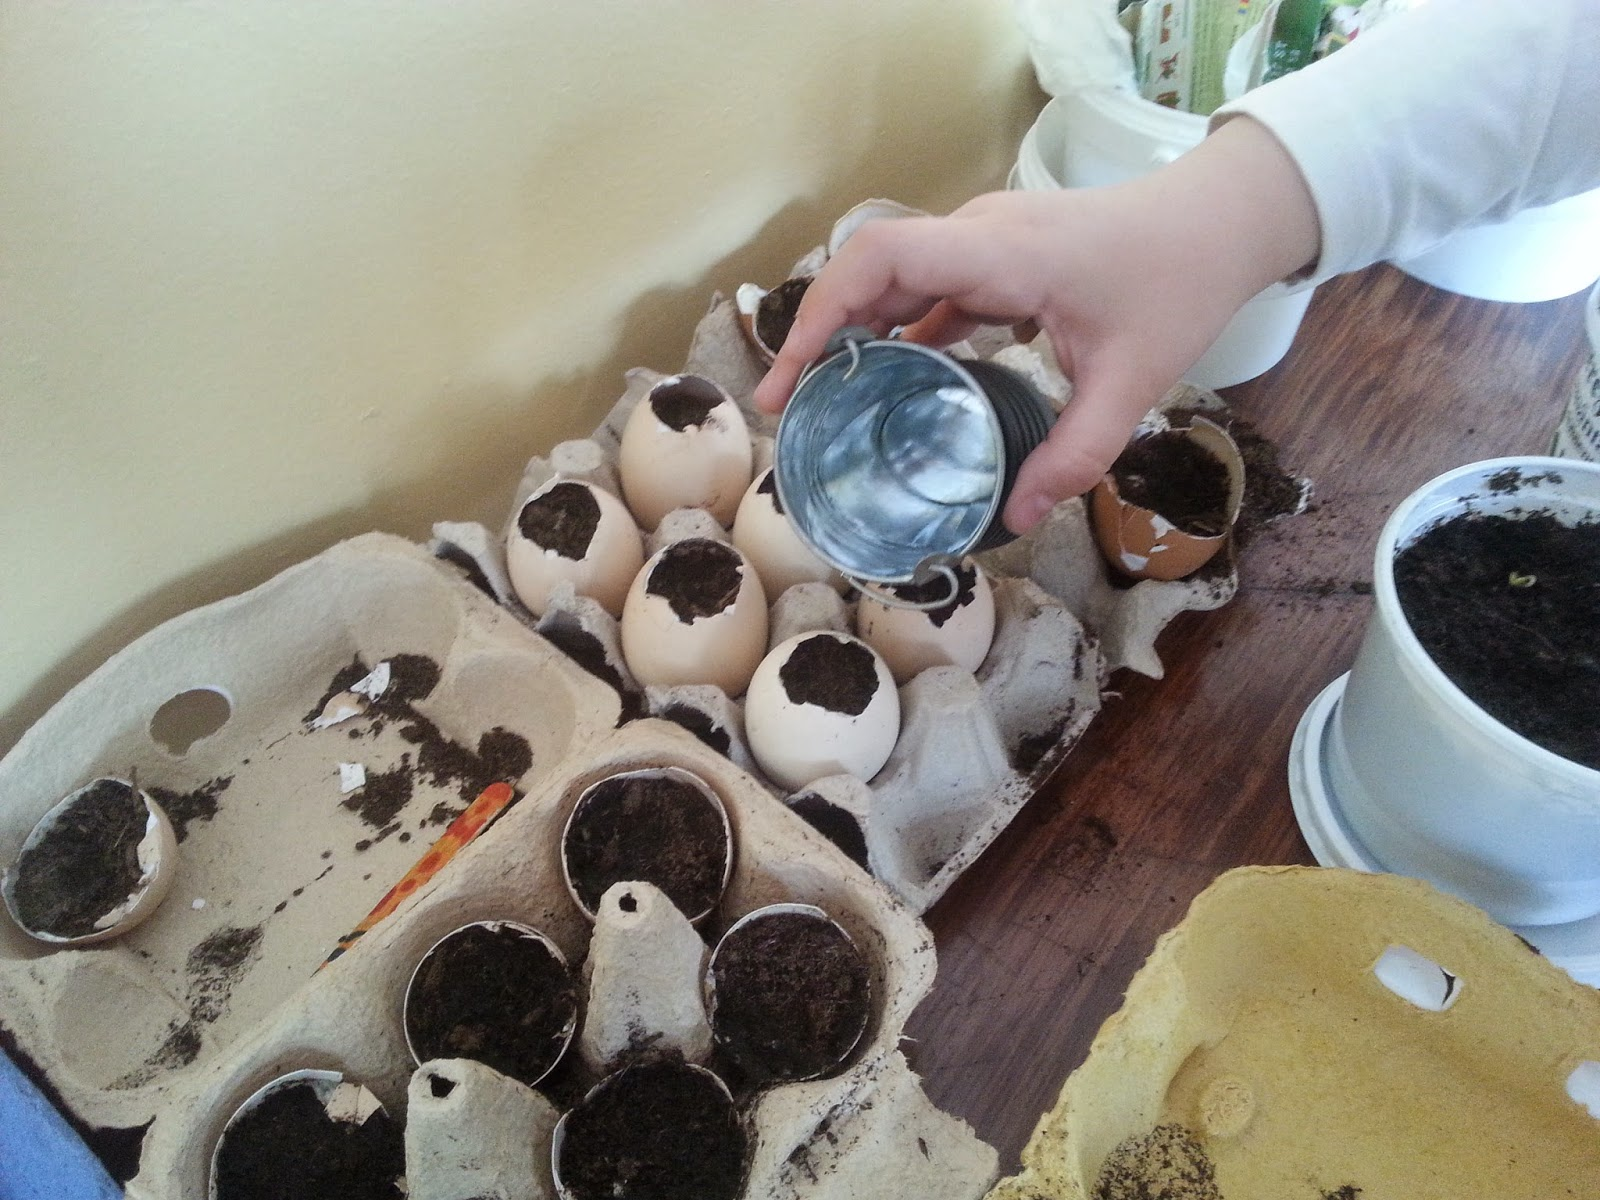 rasaduri in coji de oua